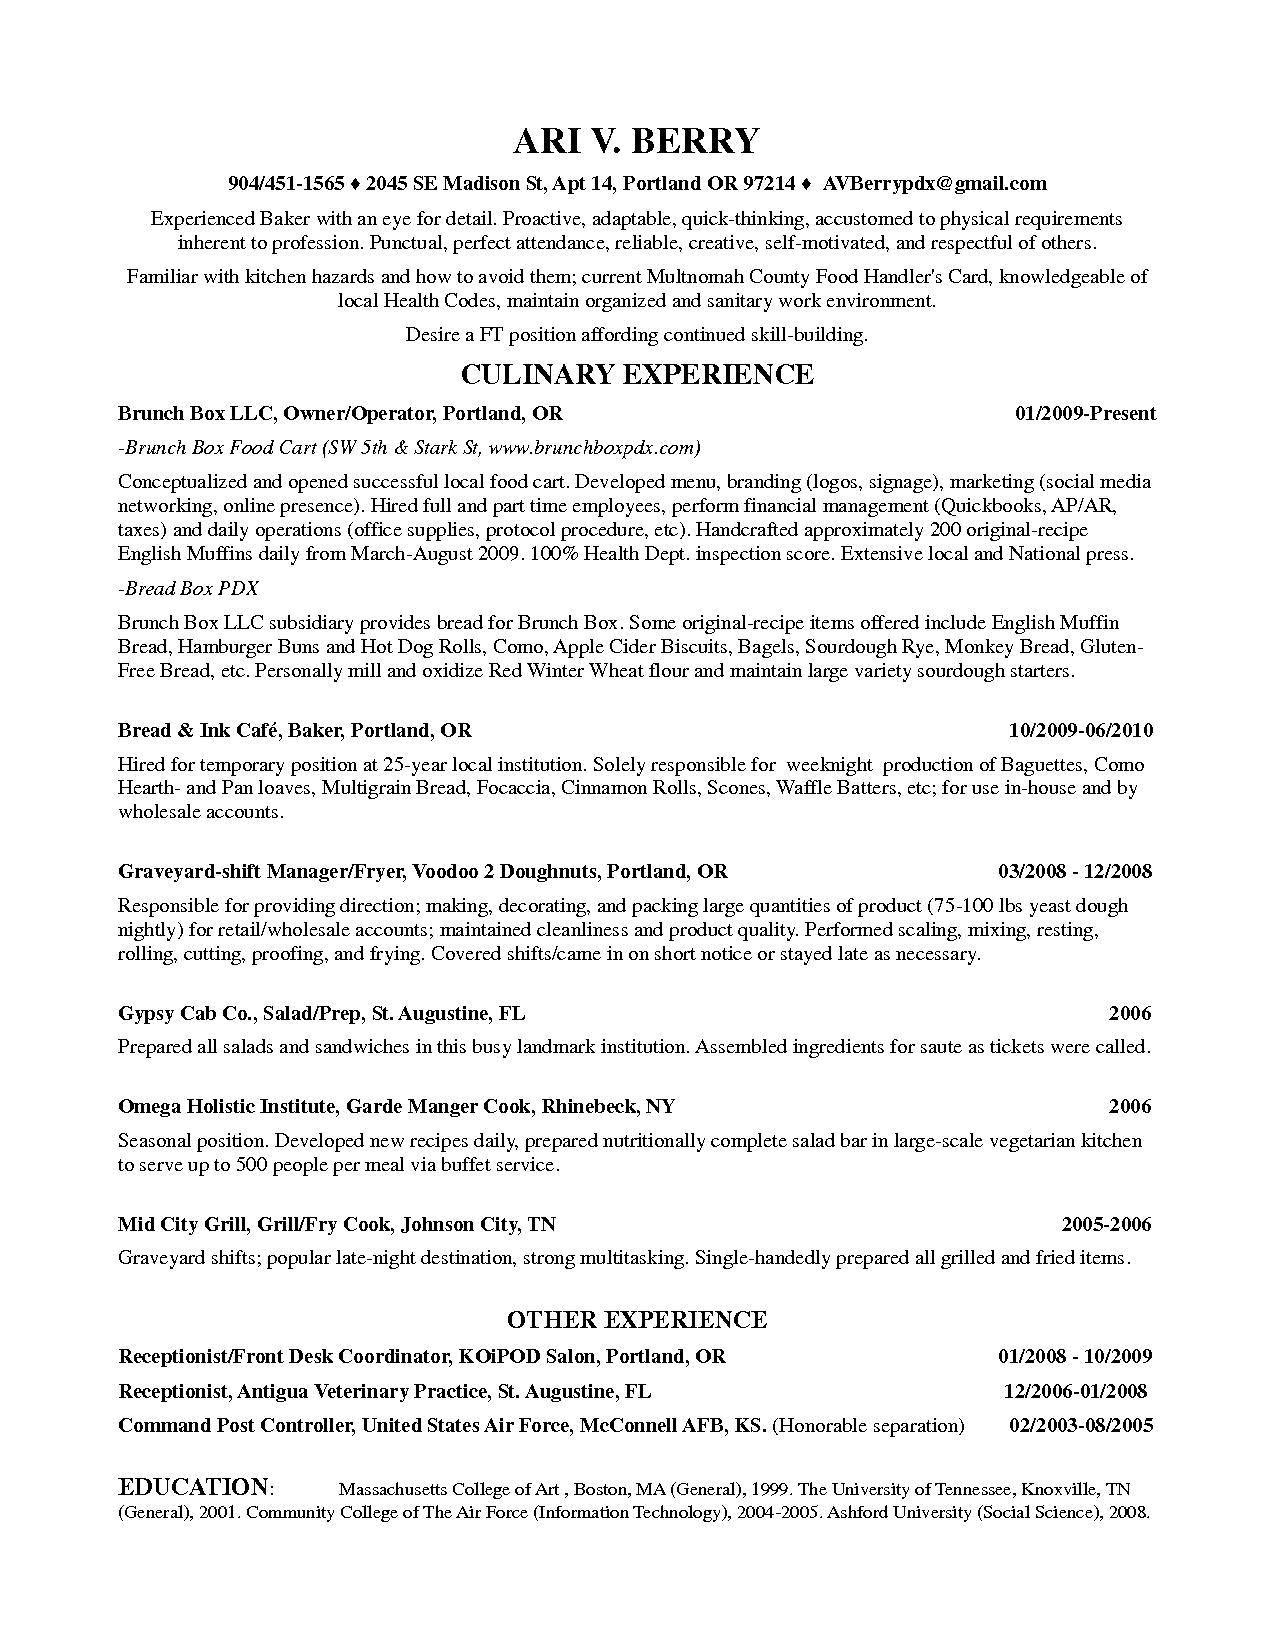 Resume Veterinary Technician Examples Veterinarian